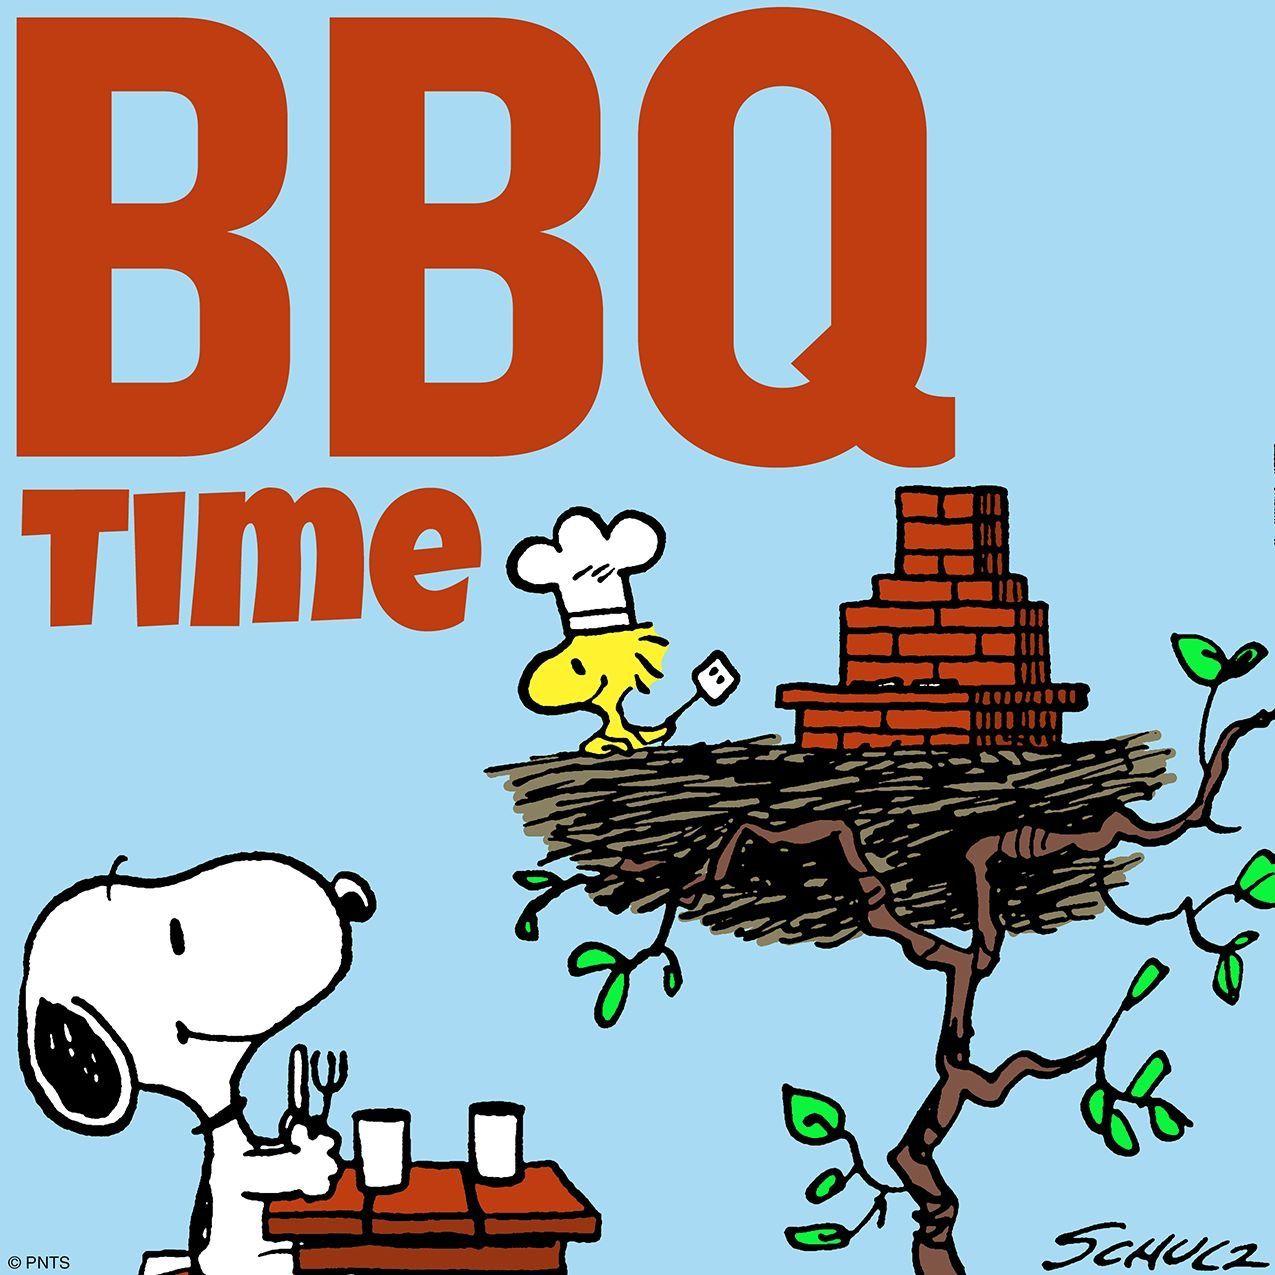 Woodstock quot peanuts quot desktop wallpaper - Snoopy And Woodstock It S Bbq Time